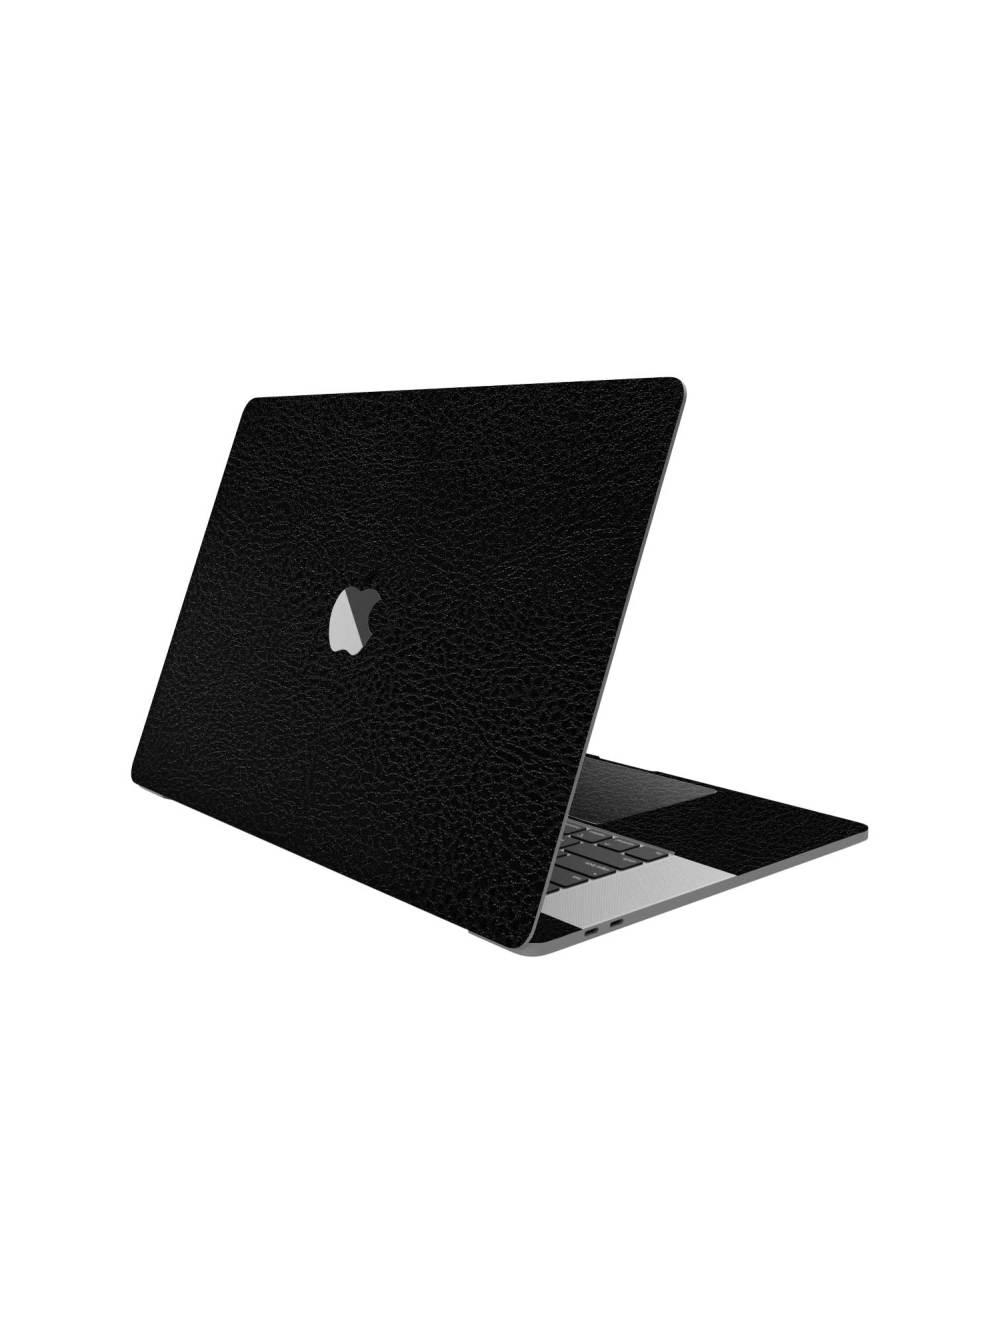 Black Leather Skin for Apple Macbook Pro M1 2020